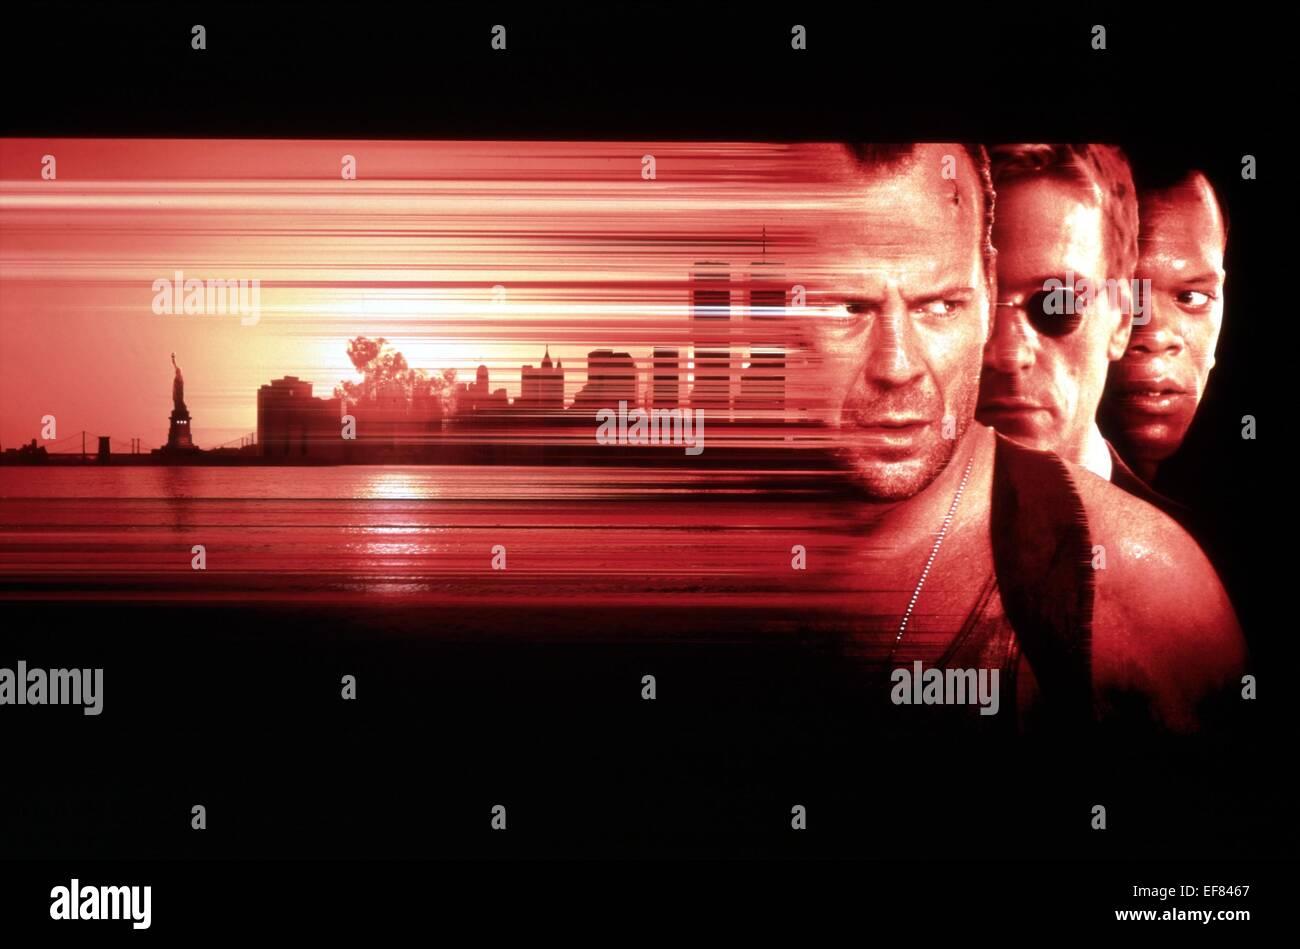 Bruce Willis Jeremy Irons Samuel L Jackson Movie Poster Die Hard Stock Photo Alamy